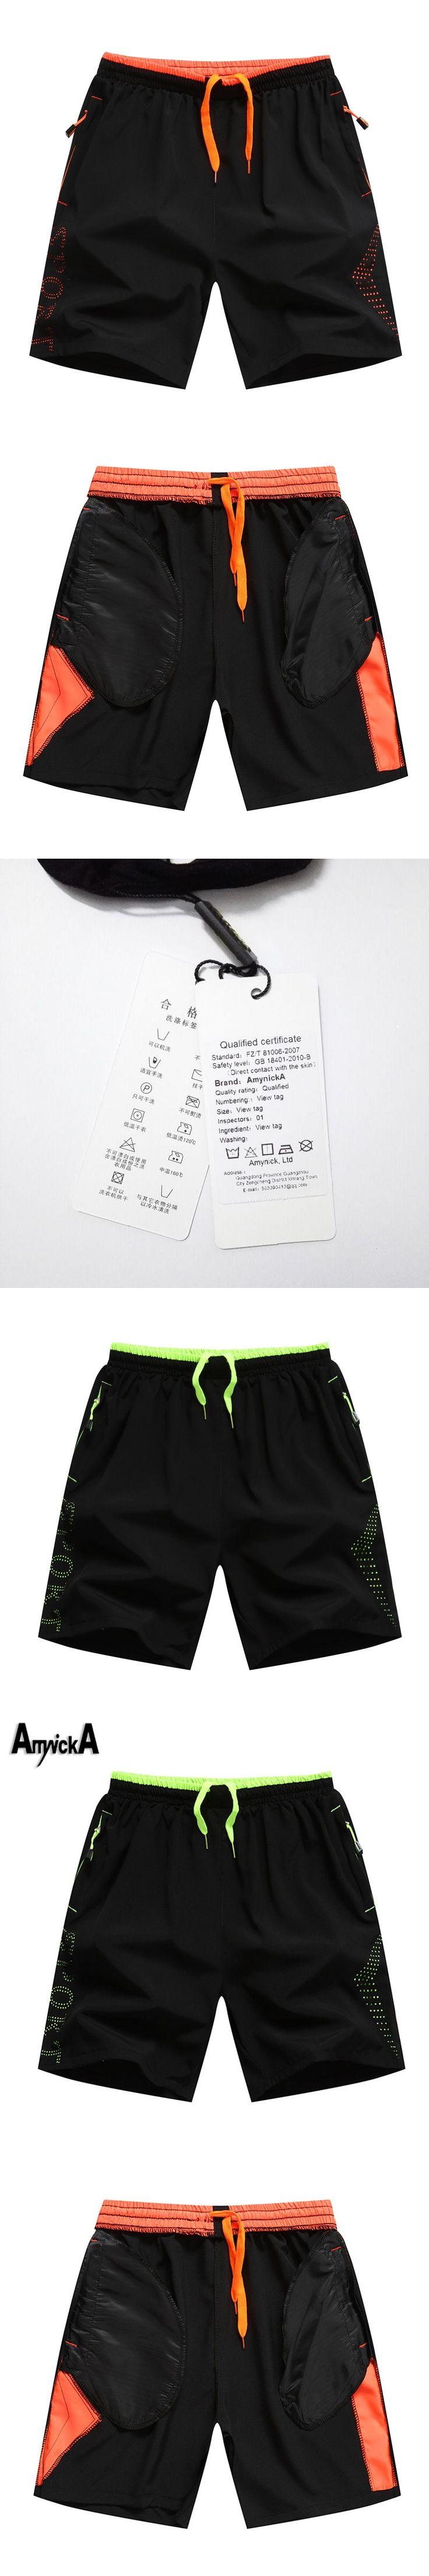 AmynickA Sport Shorts Mens Boys Summer Thin Cycling Running Basketball Soccer Jogging Football Fitness Hiking Gym Shorts Male A5